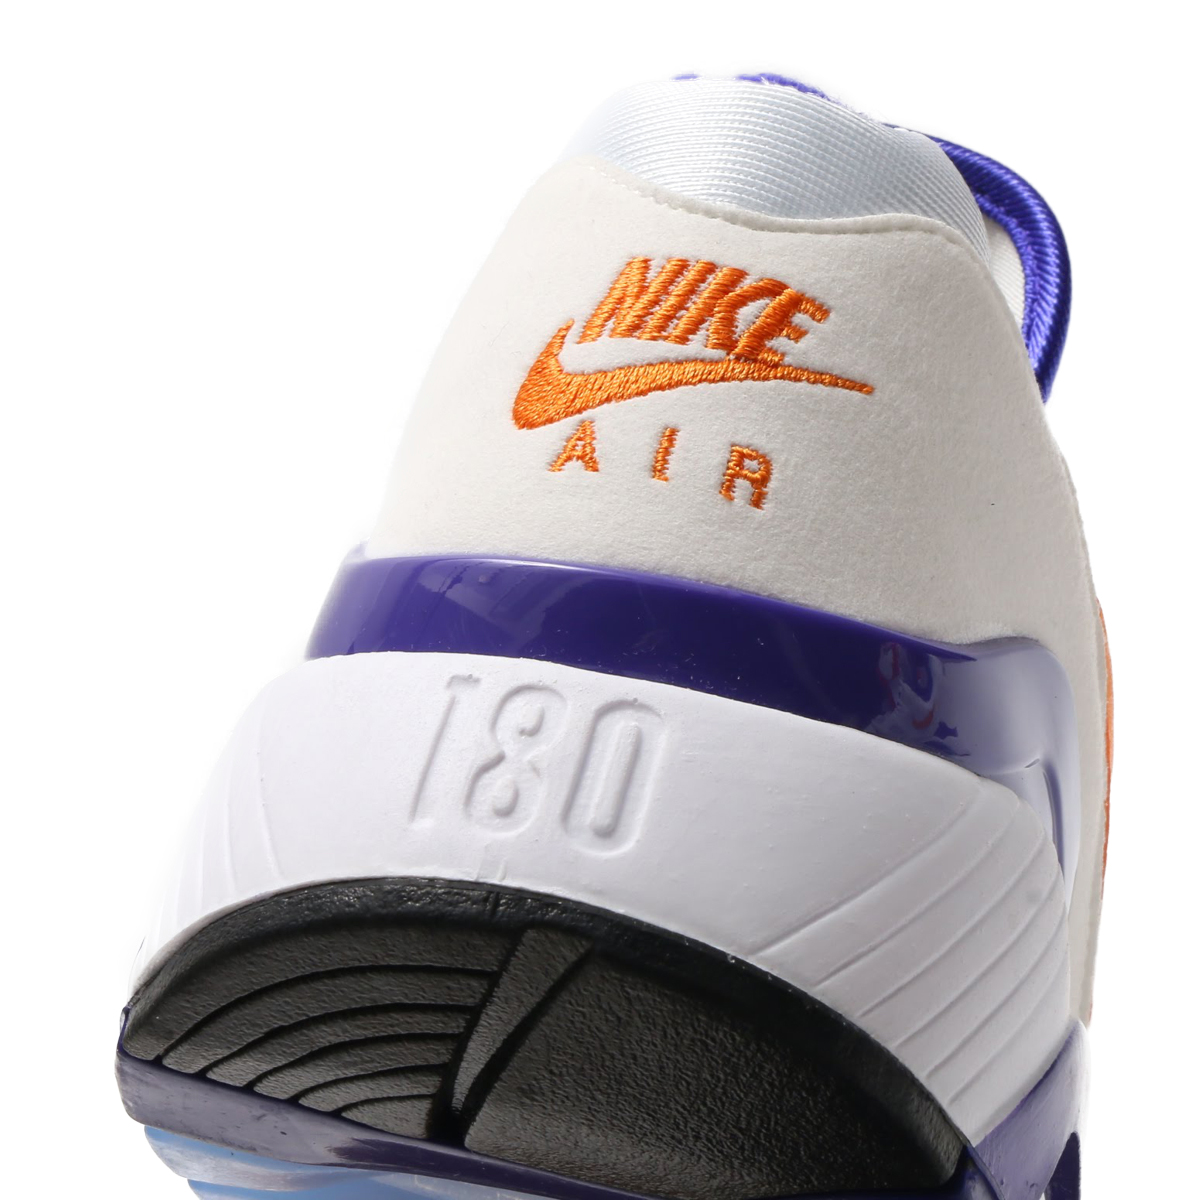 hot sale online b814a 7bb32 NIKE AIR MAX 180 (Kie Ney AMAX 180) (WHITE BRIGHT CERAMIC-DARK CONCORD) 18SP -S